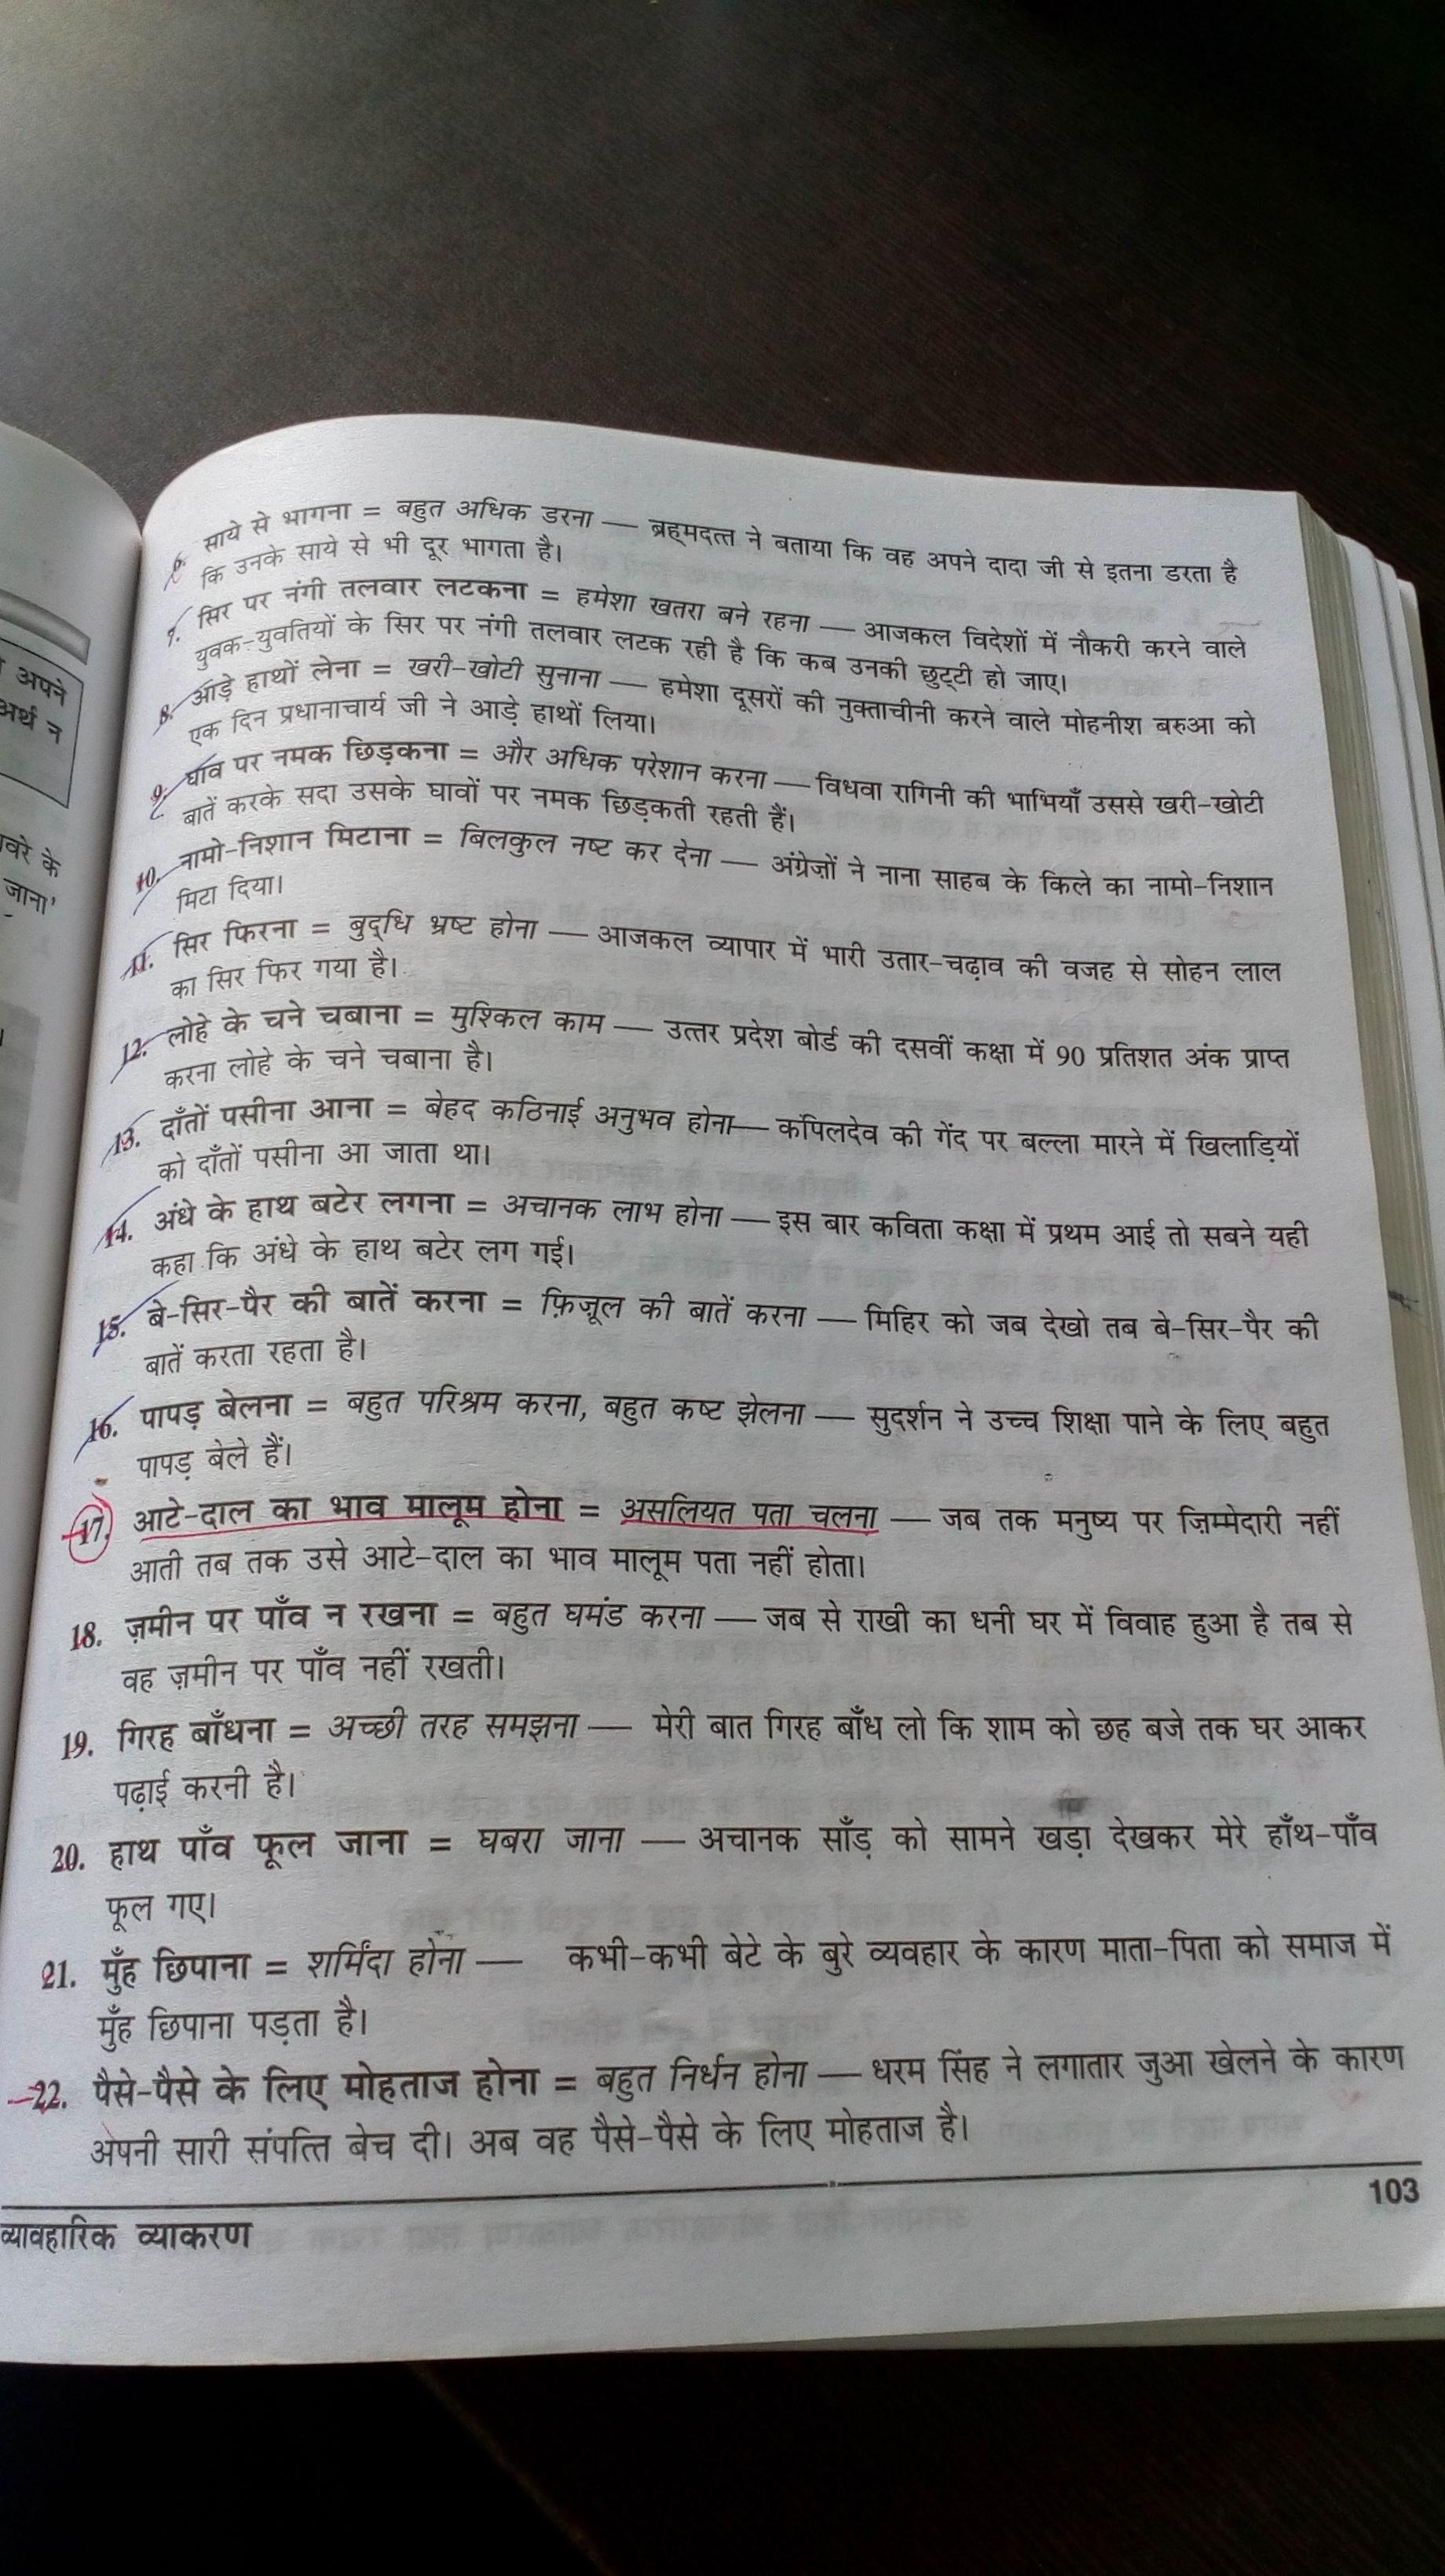 i want 20 muhavare of chapter bade bhai sahab with their